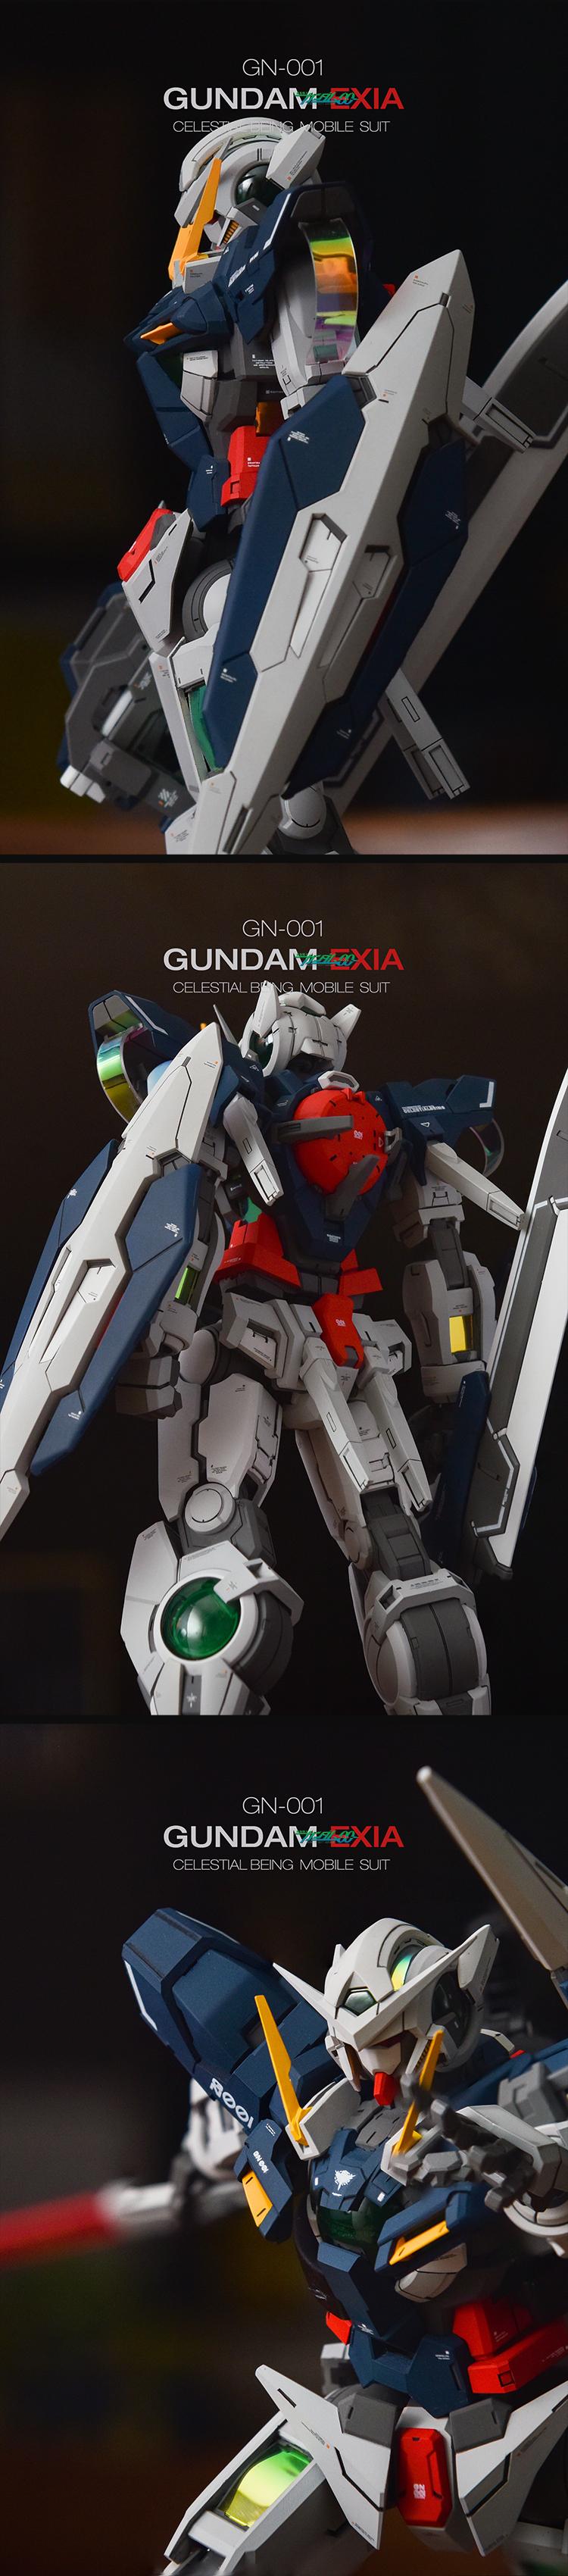 G785_Topless_MG_EXIA_GK_012.jpg